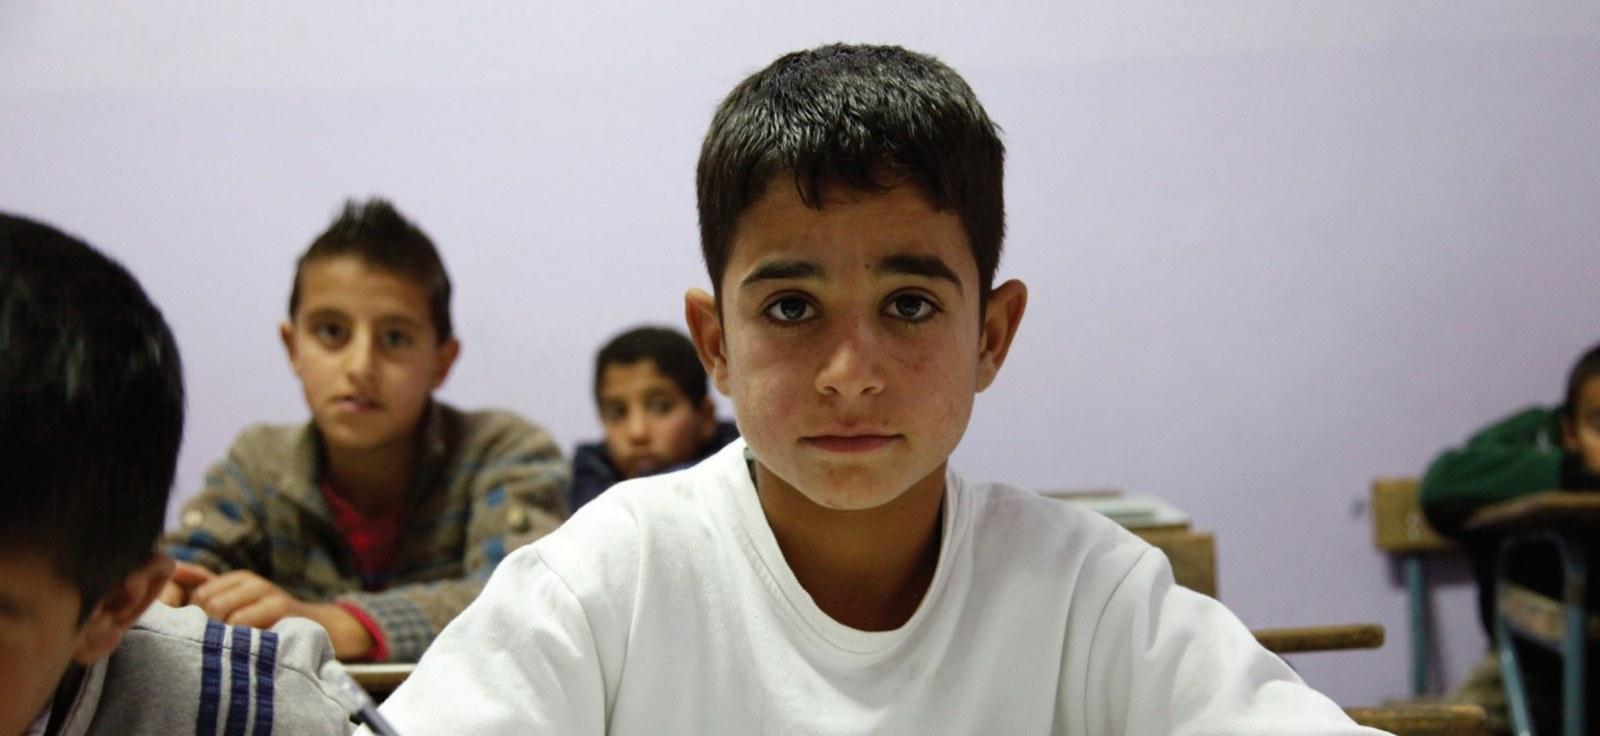 projet-grandir-en-paix-au-liban